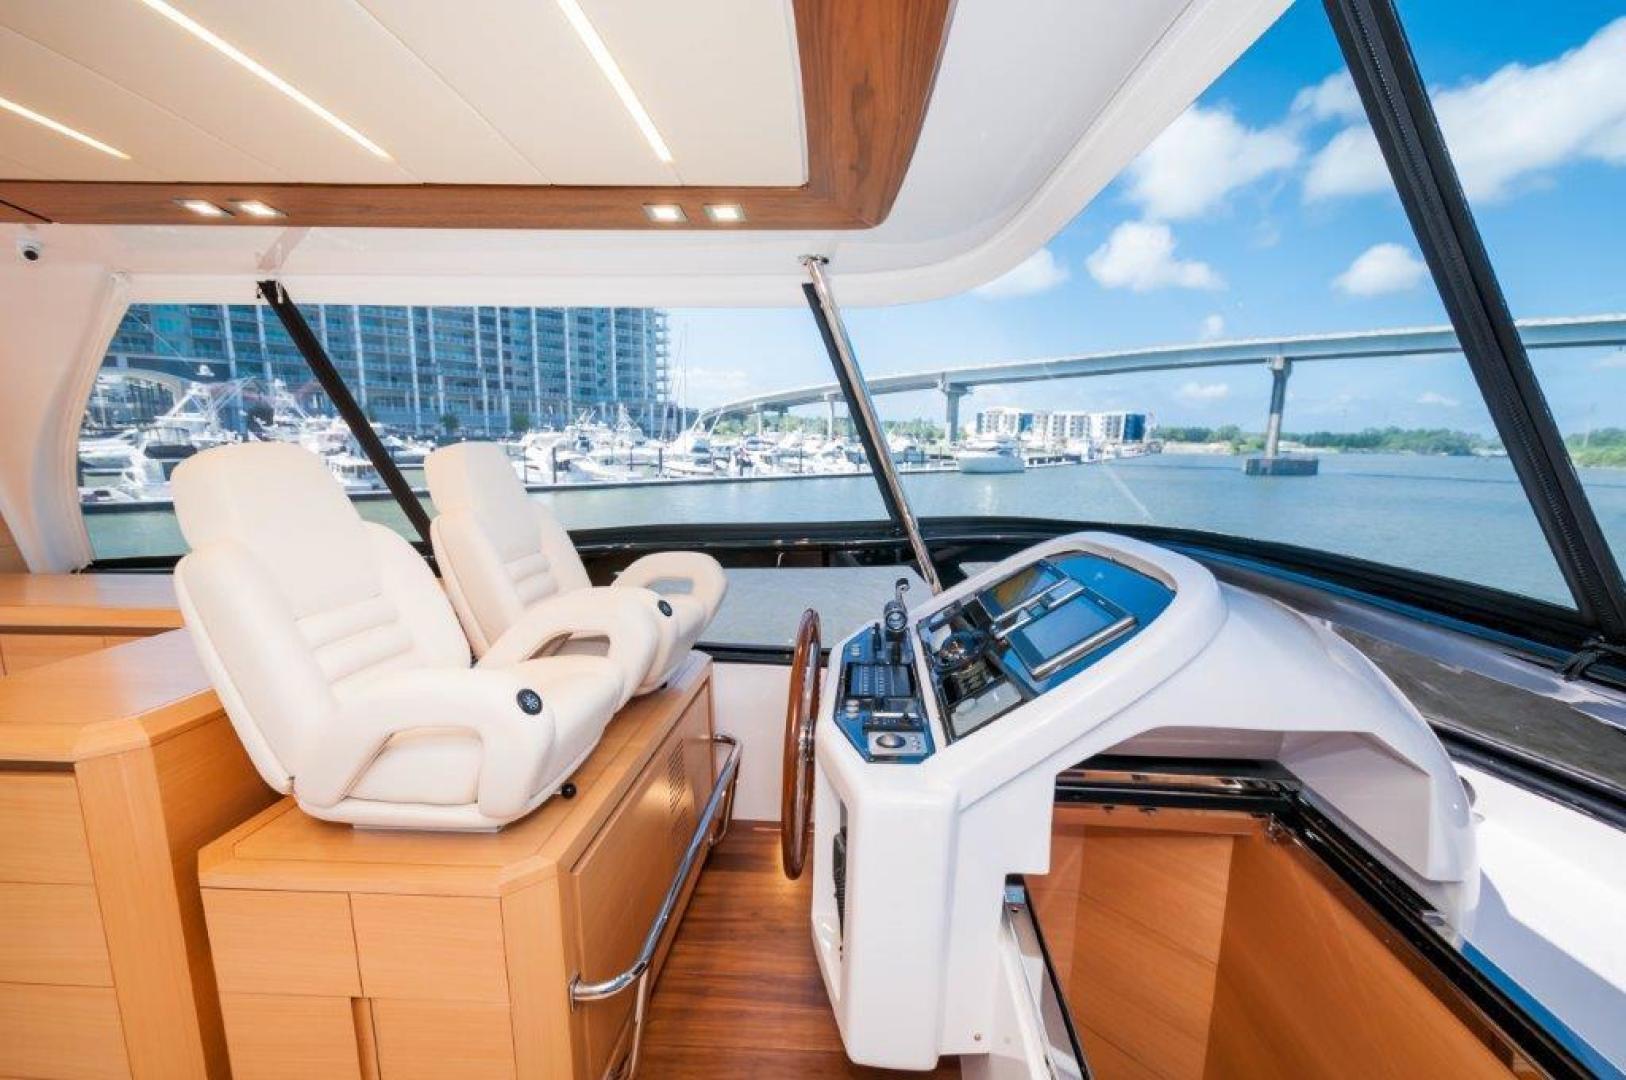 Maiora-84 Motor Yacht 2015-Never Rest SANDESTIN-Florida-United States-2015 Maiora 84 Motor Yacht Flybridge Helm Never Rest-720591 | Thumbnail